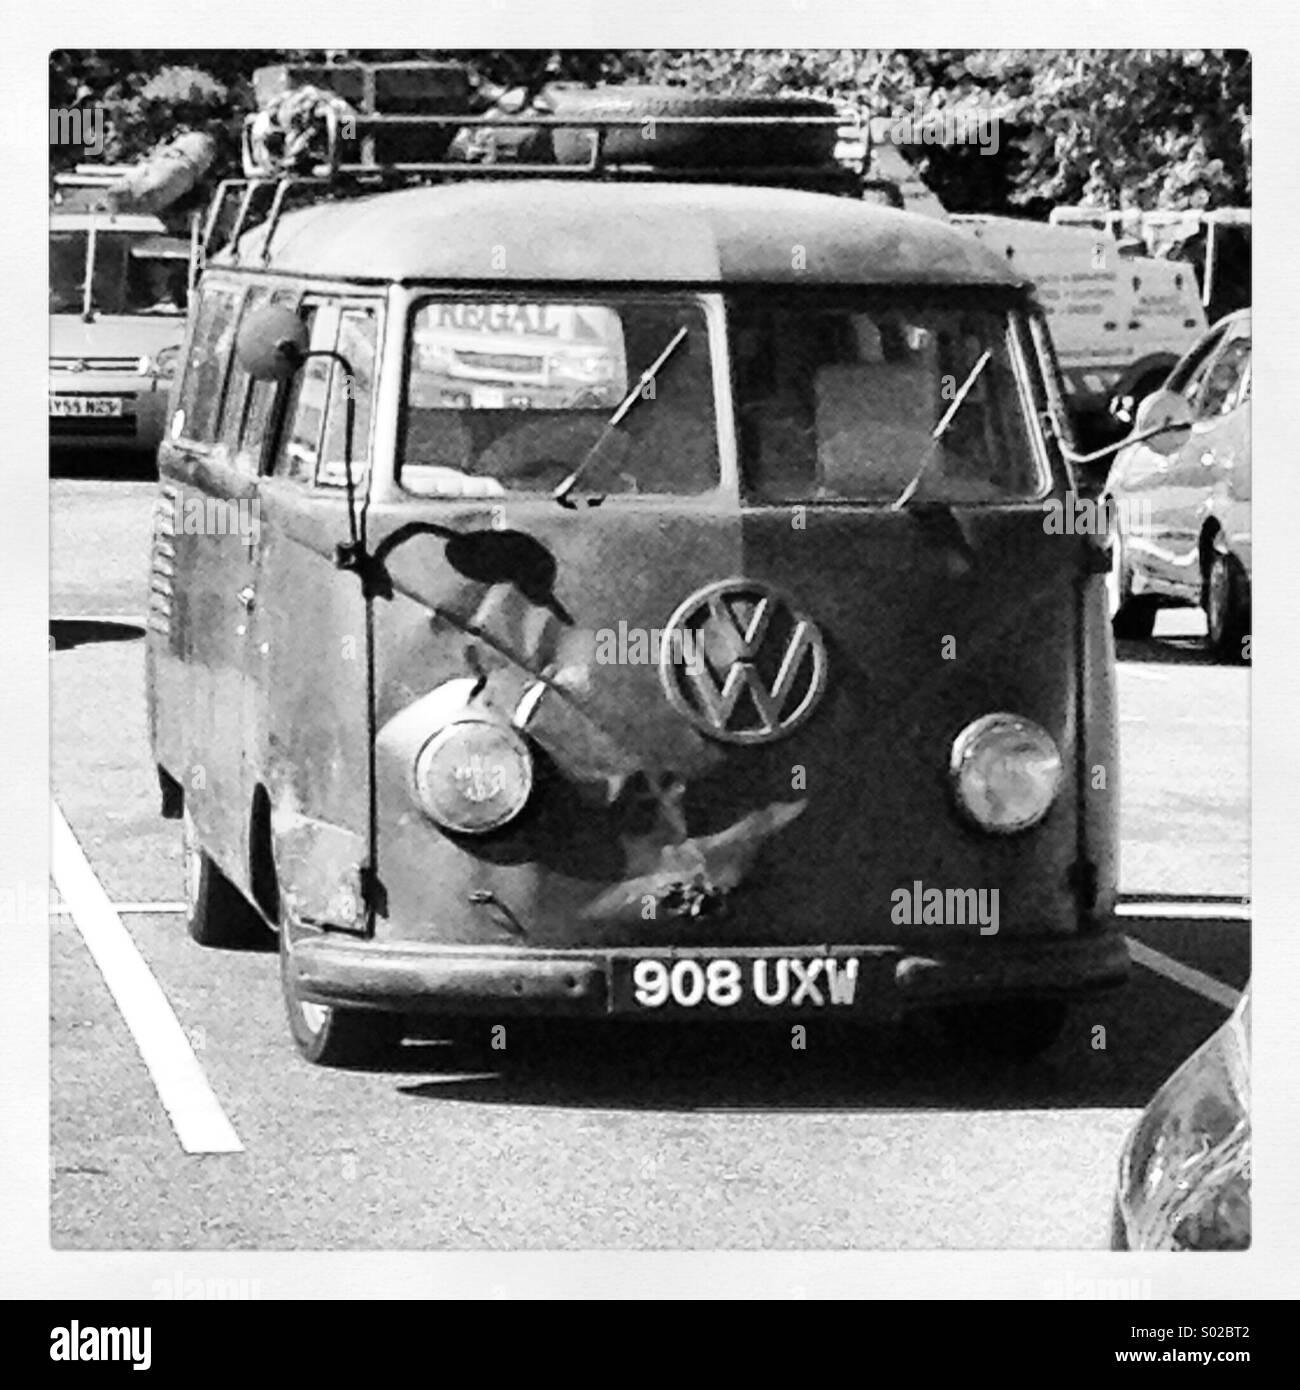 Old skool camper - Stock Image